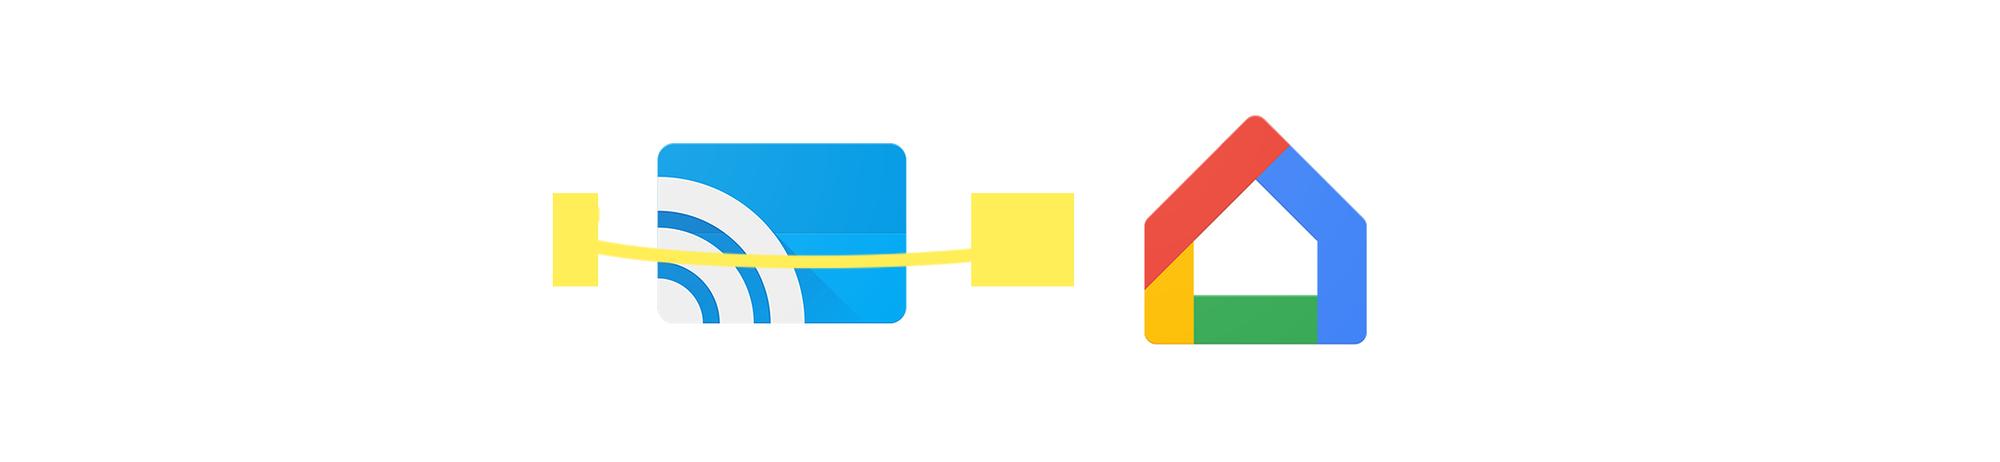 new Google Home app logo